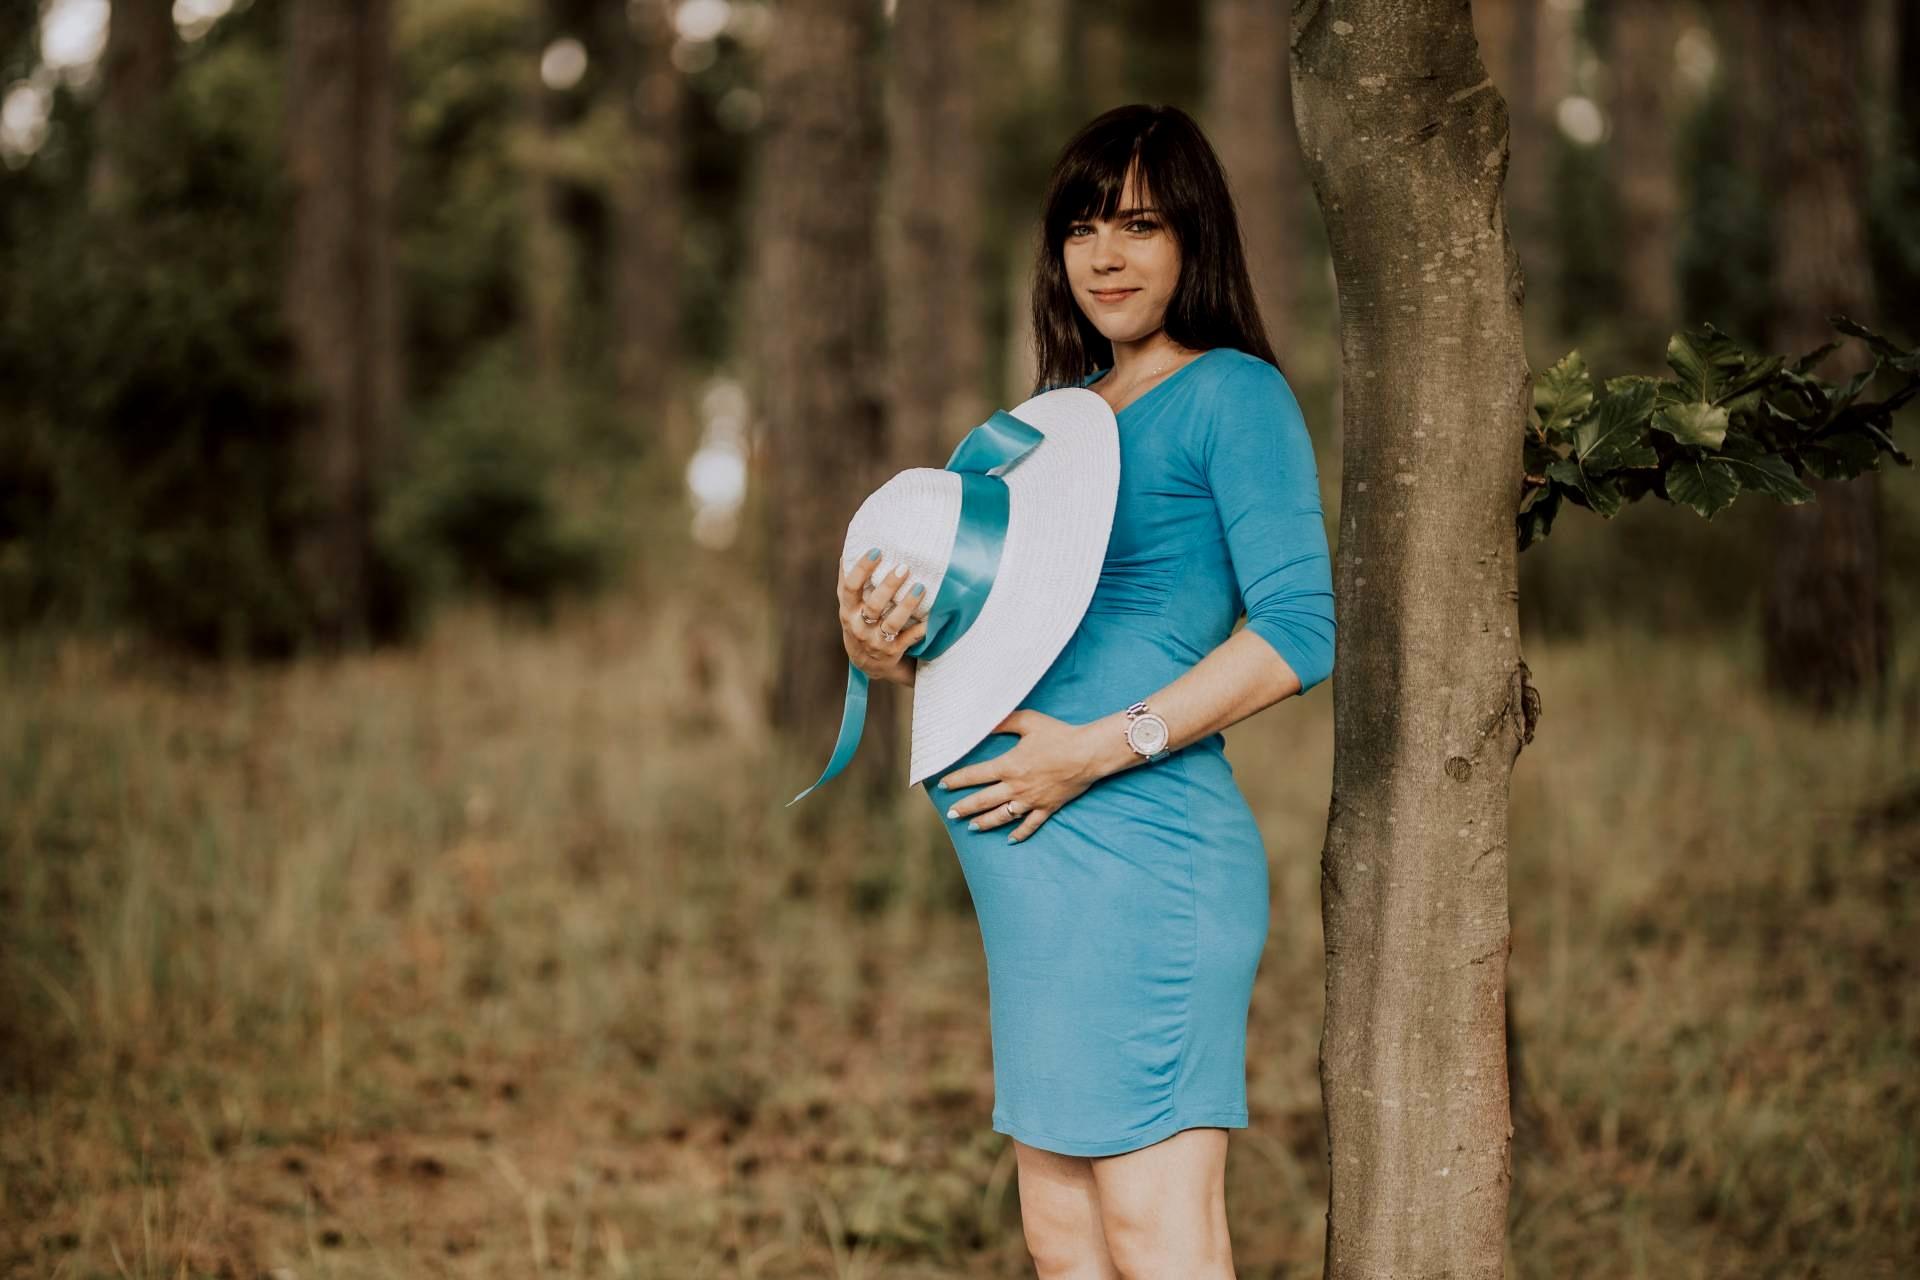 tehotenske foto formou rande